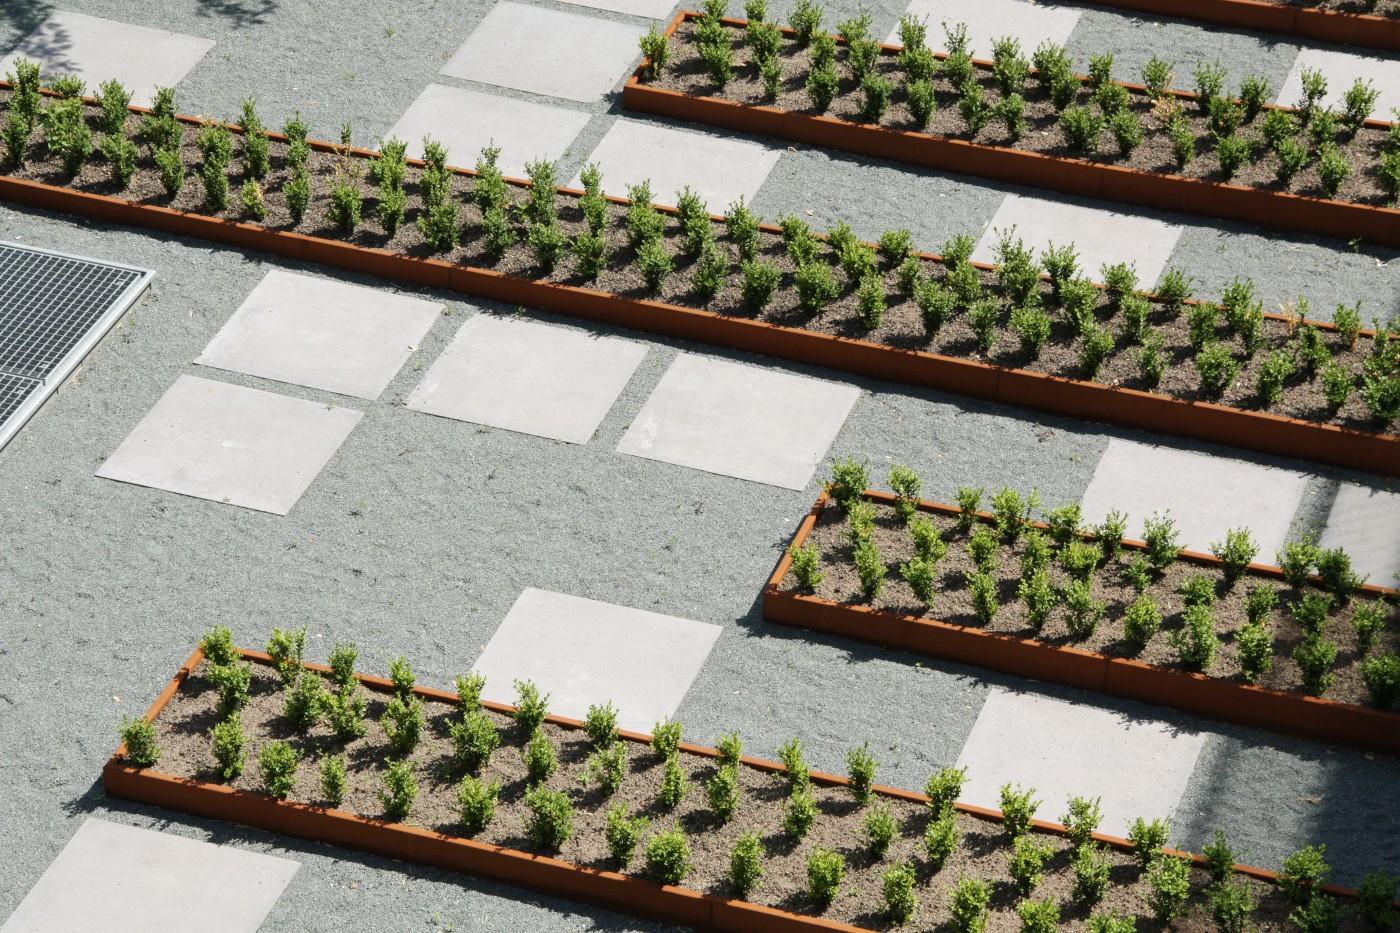 buro-sant-en-co-landschapsarchitectuur-Masira-Amsterdam-Hof B-daktuin-buxus-detail